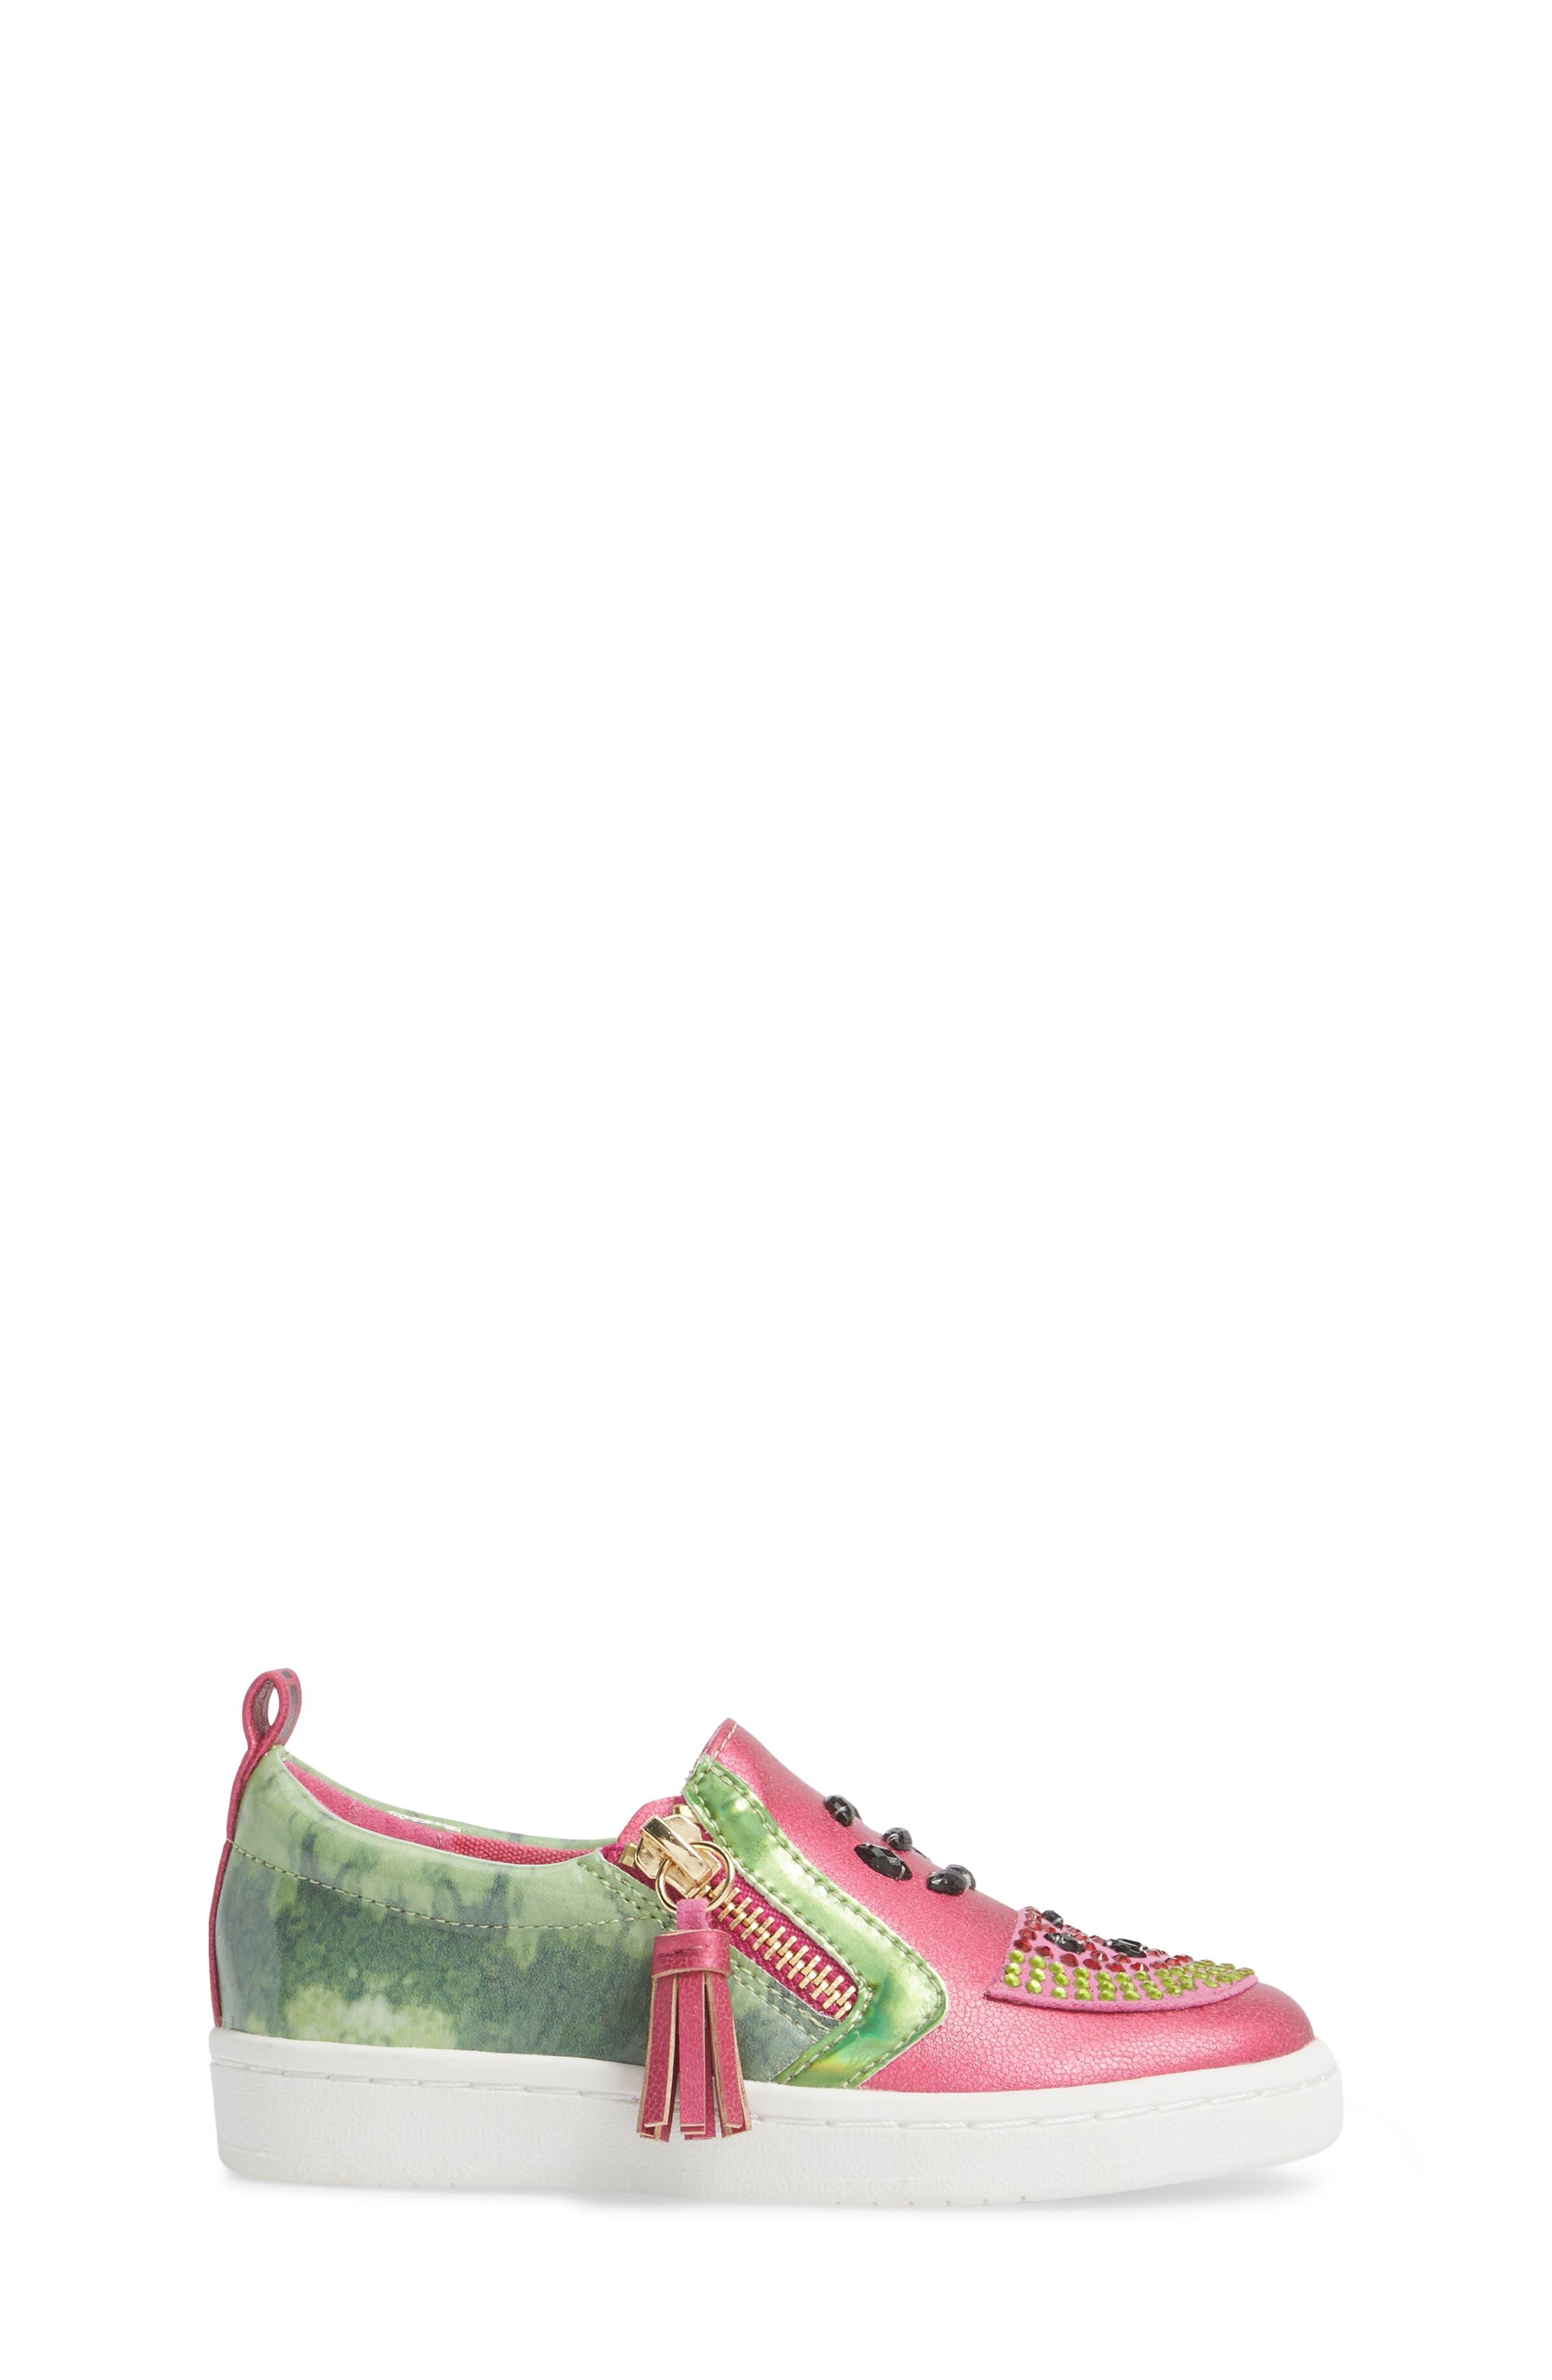 Blane Watermelon Sneaker,                             Alternate thumbnail 3, color,                             653